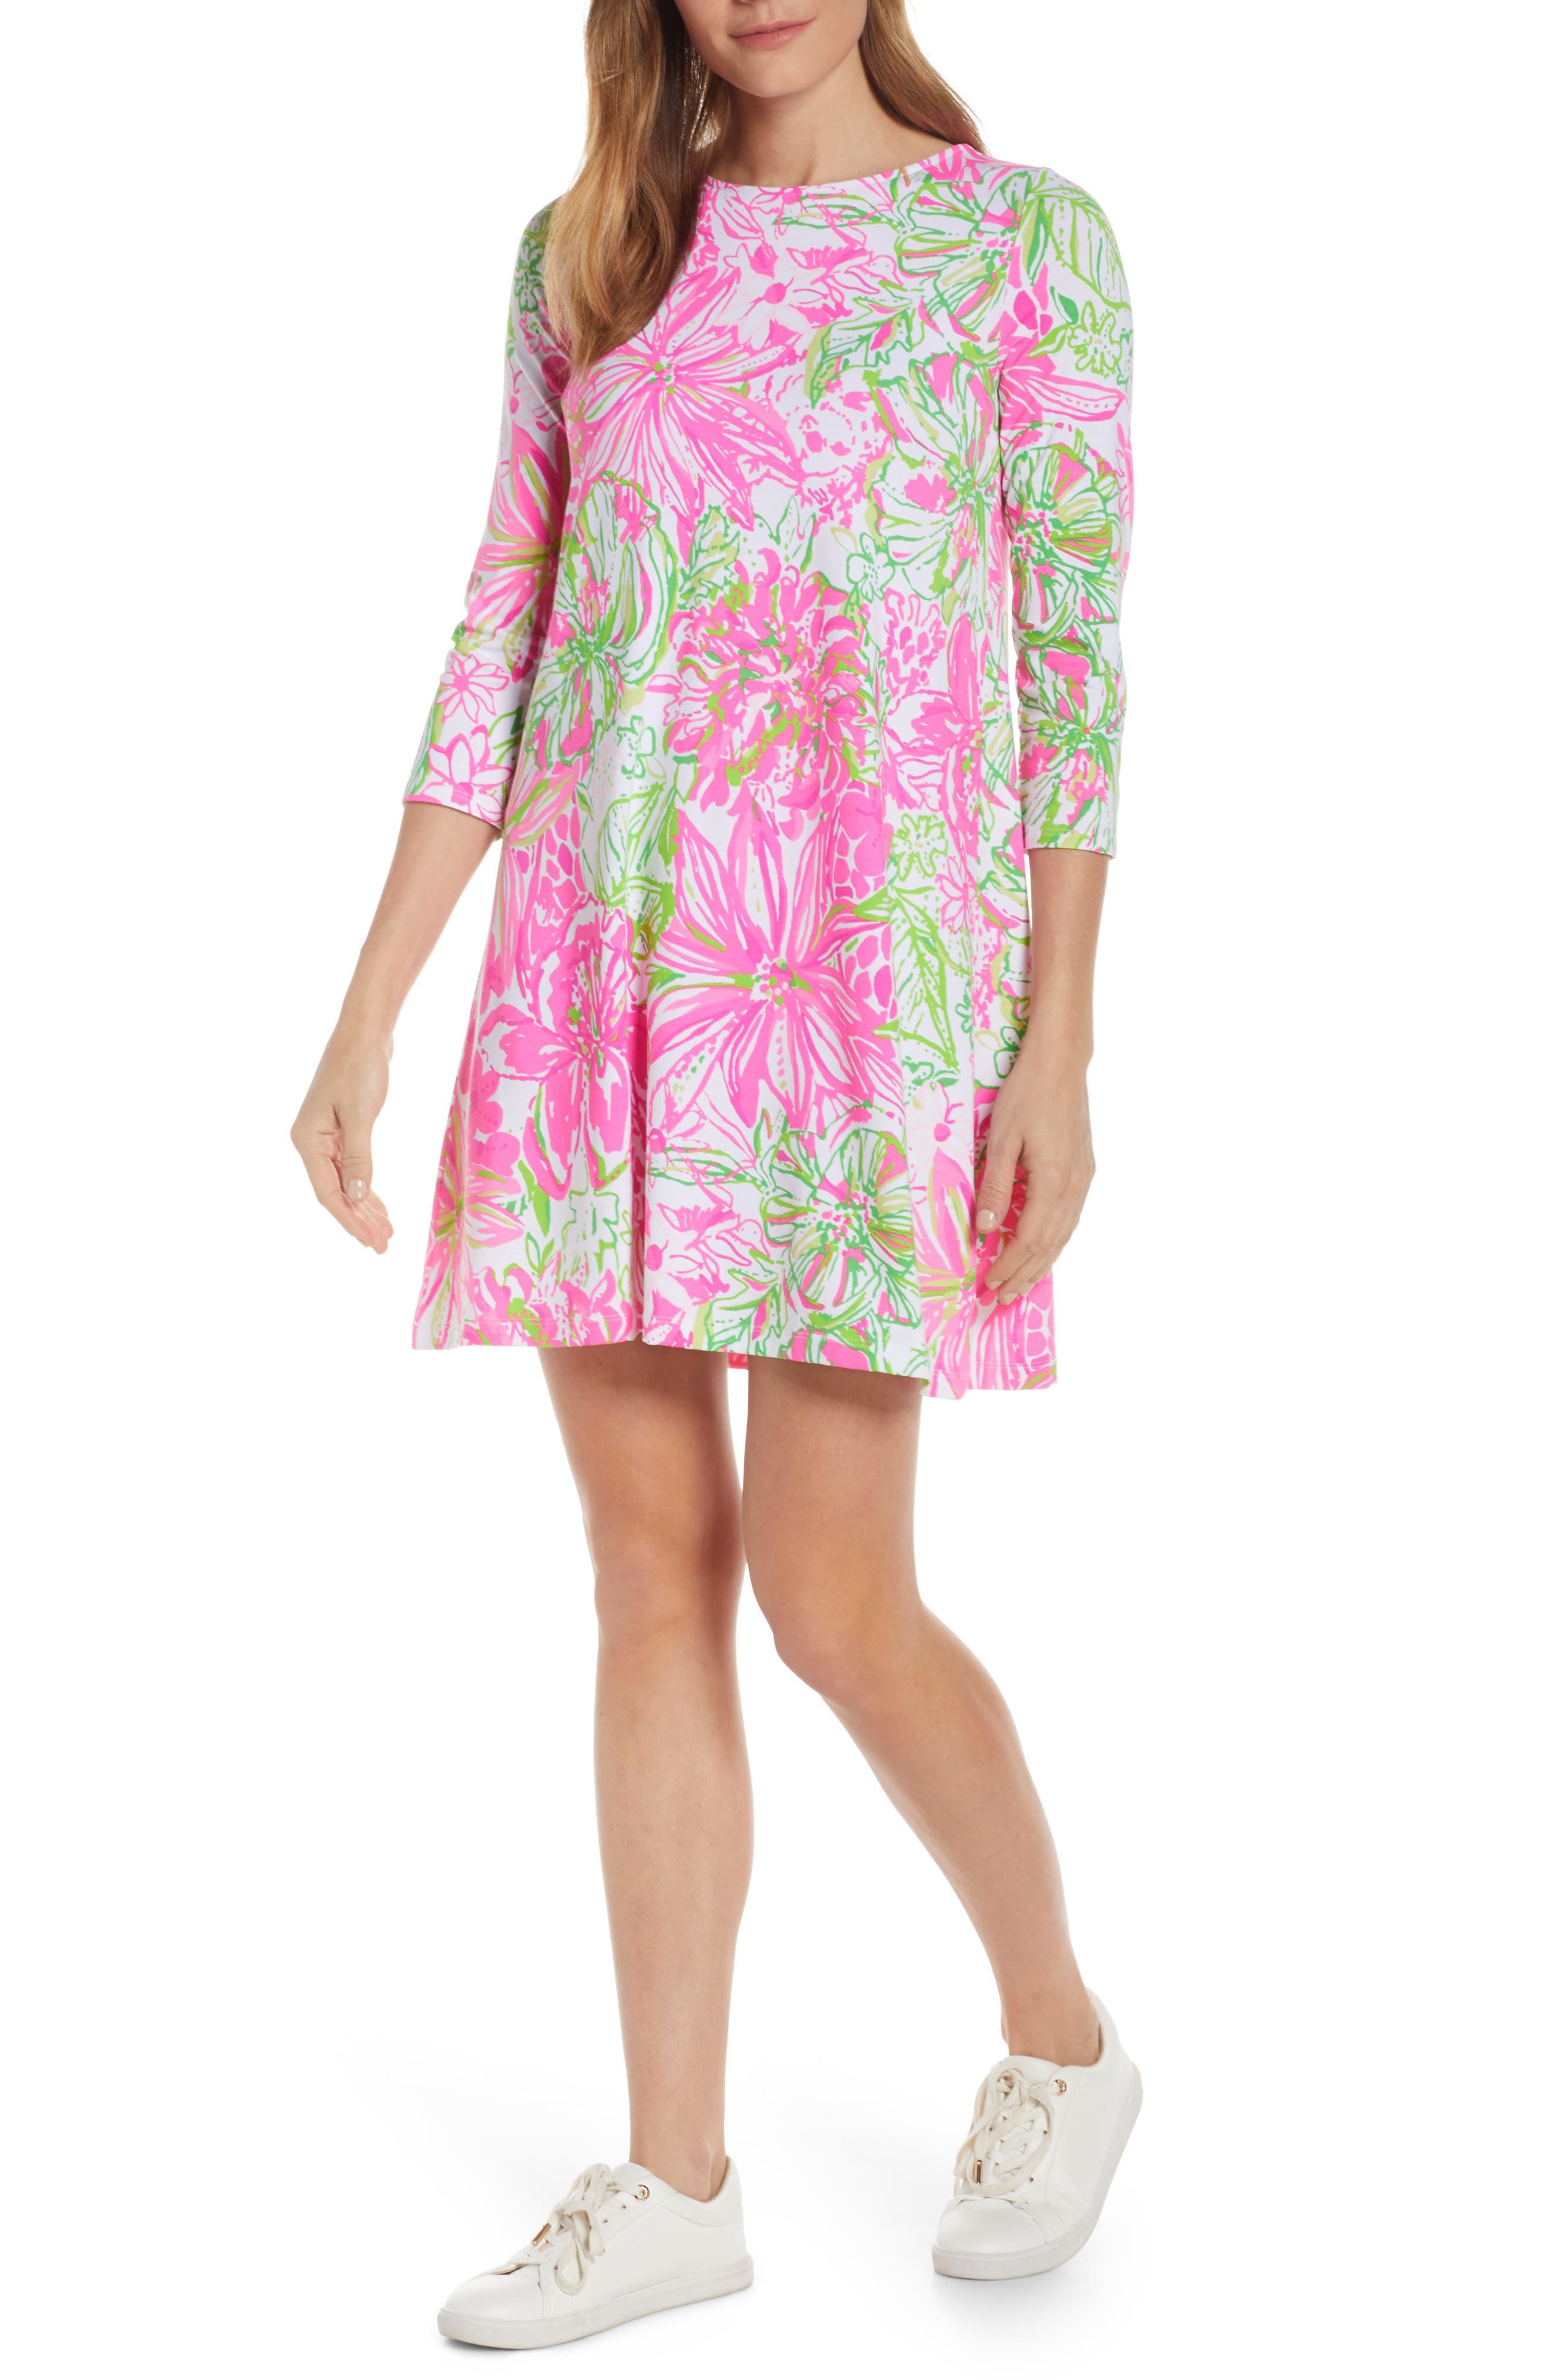 Lilly Pulitzer Ophelia Swing Dress, Pink